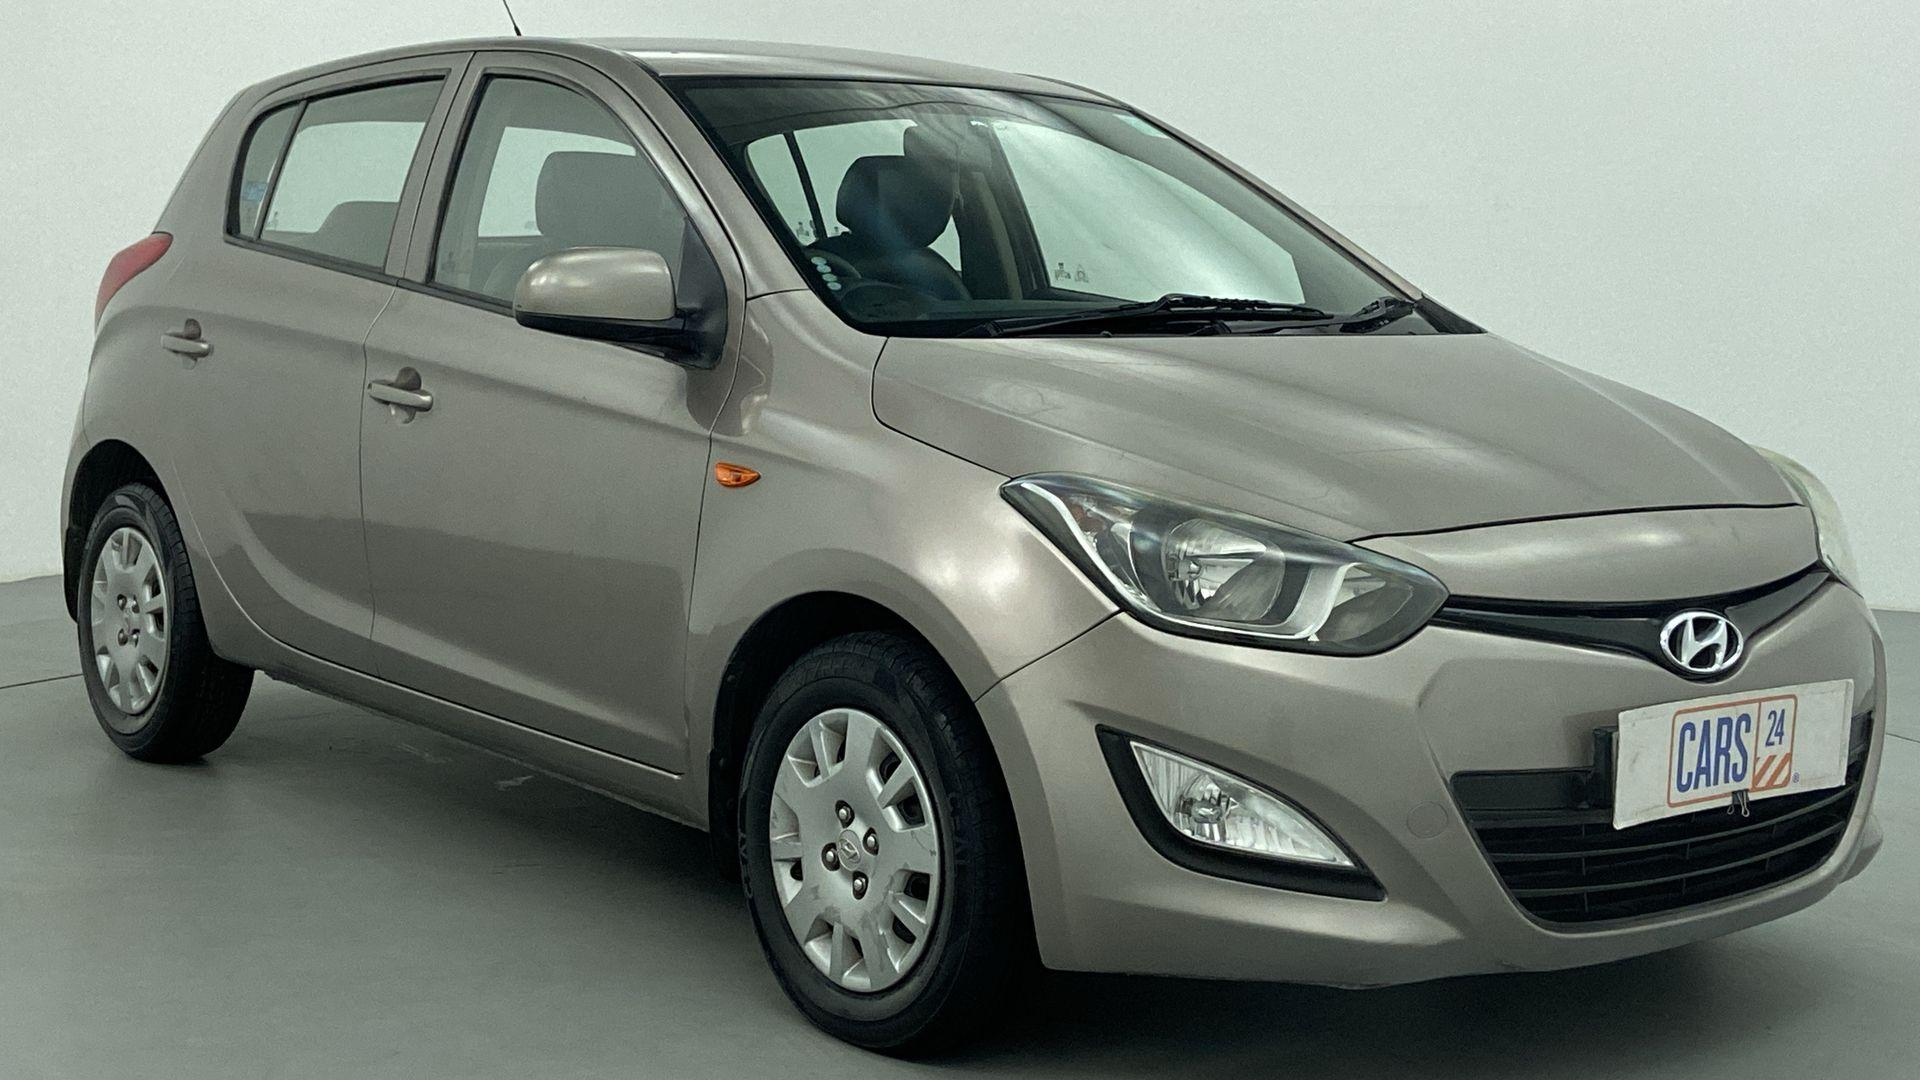 2012 Hyundai i20 MAGNA 1.4 CRDI